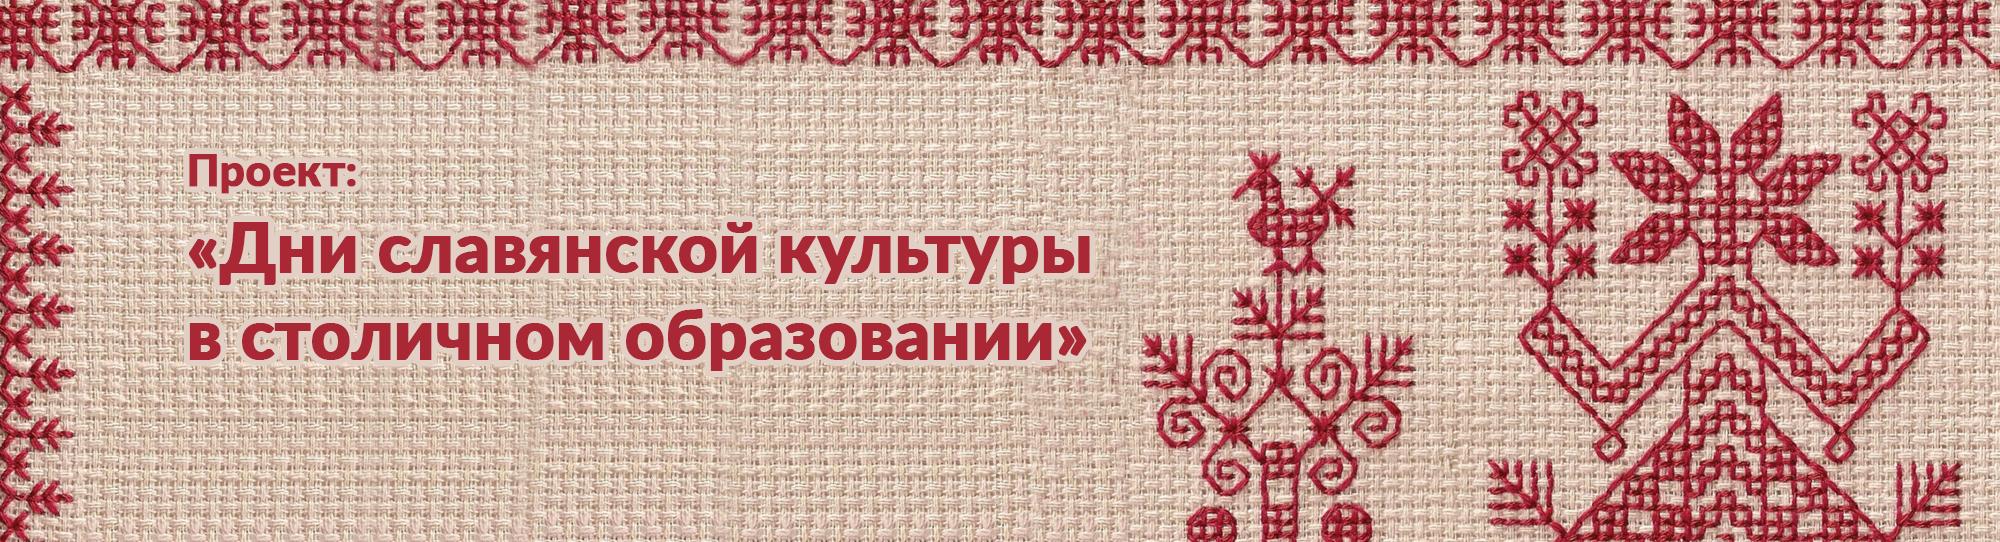 banner-slavyan